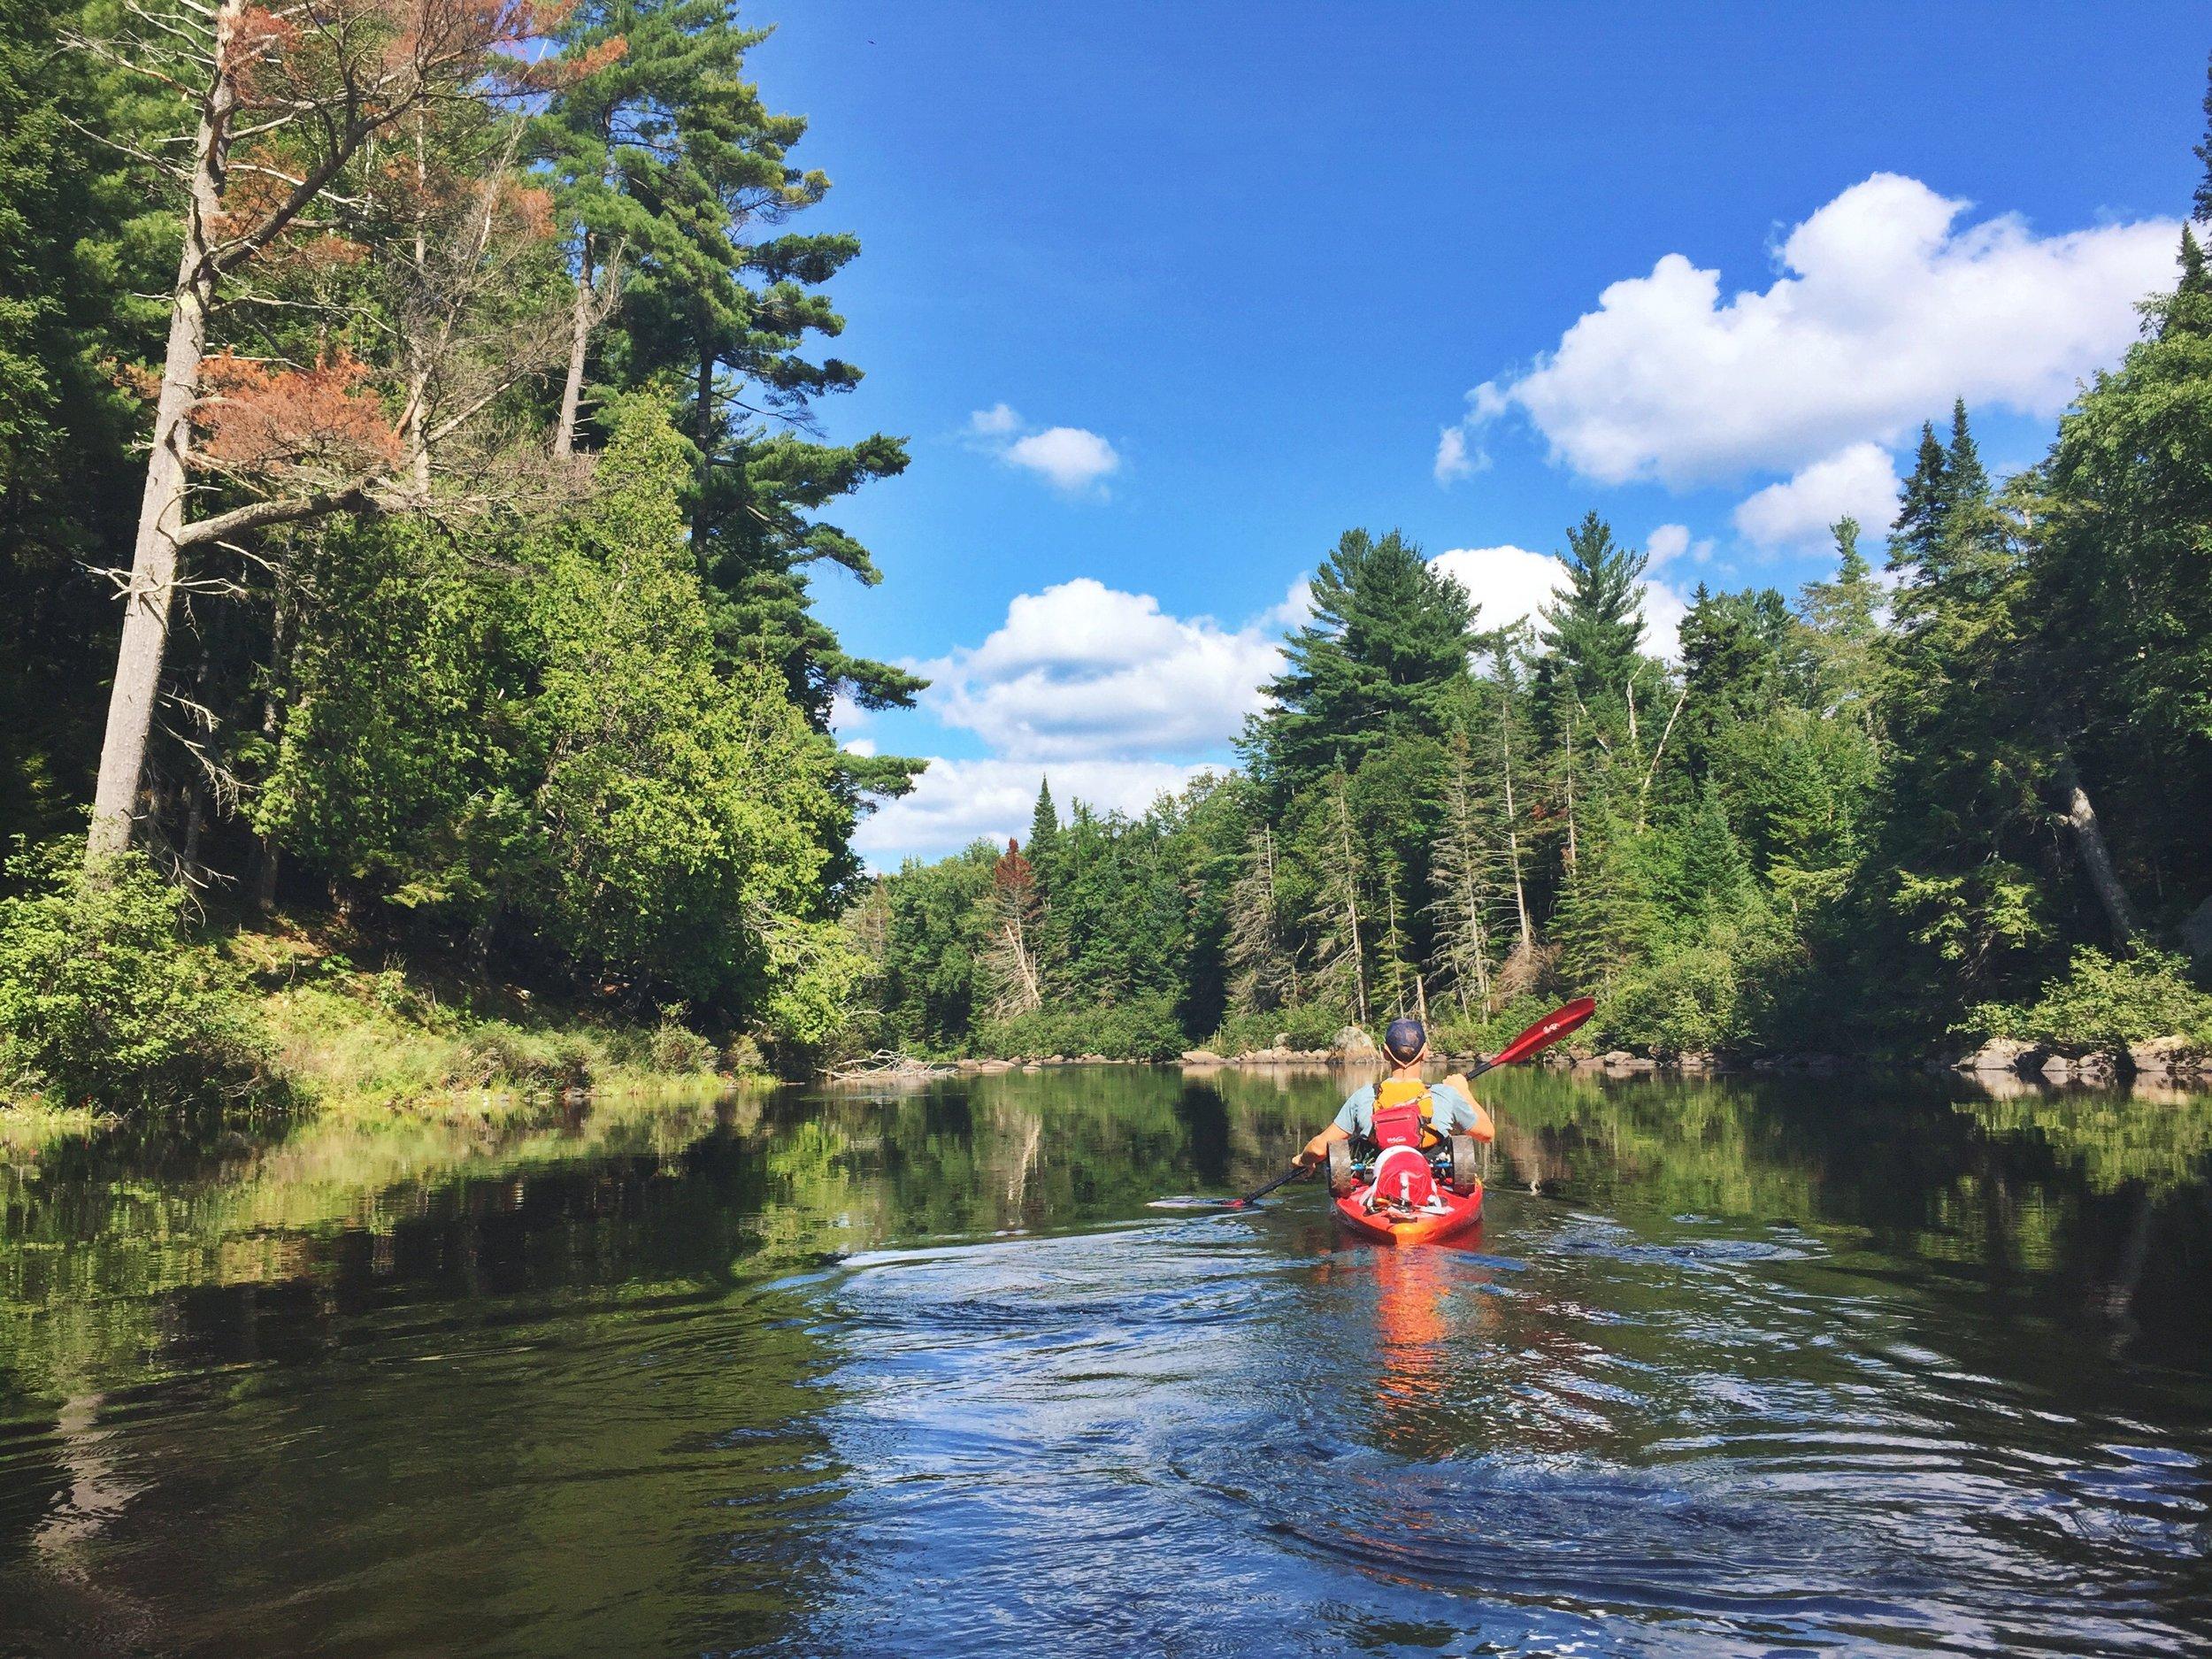 Teton paddles down the beautiful Raquette River.